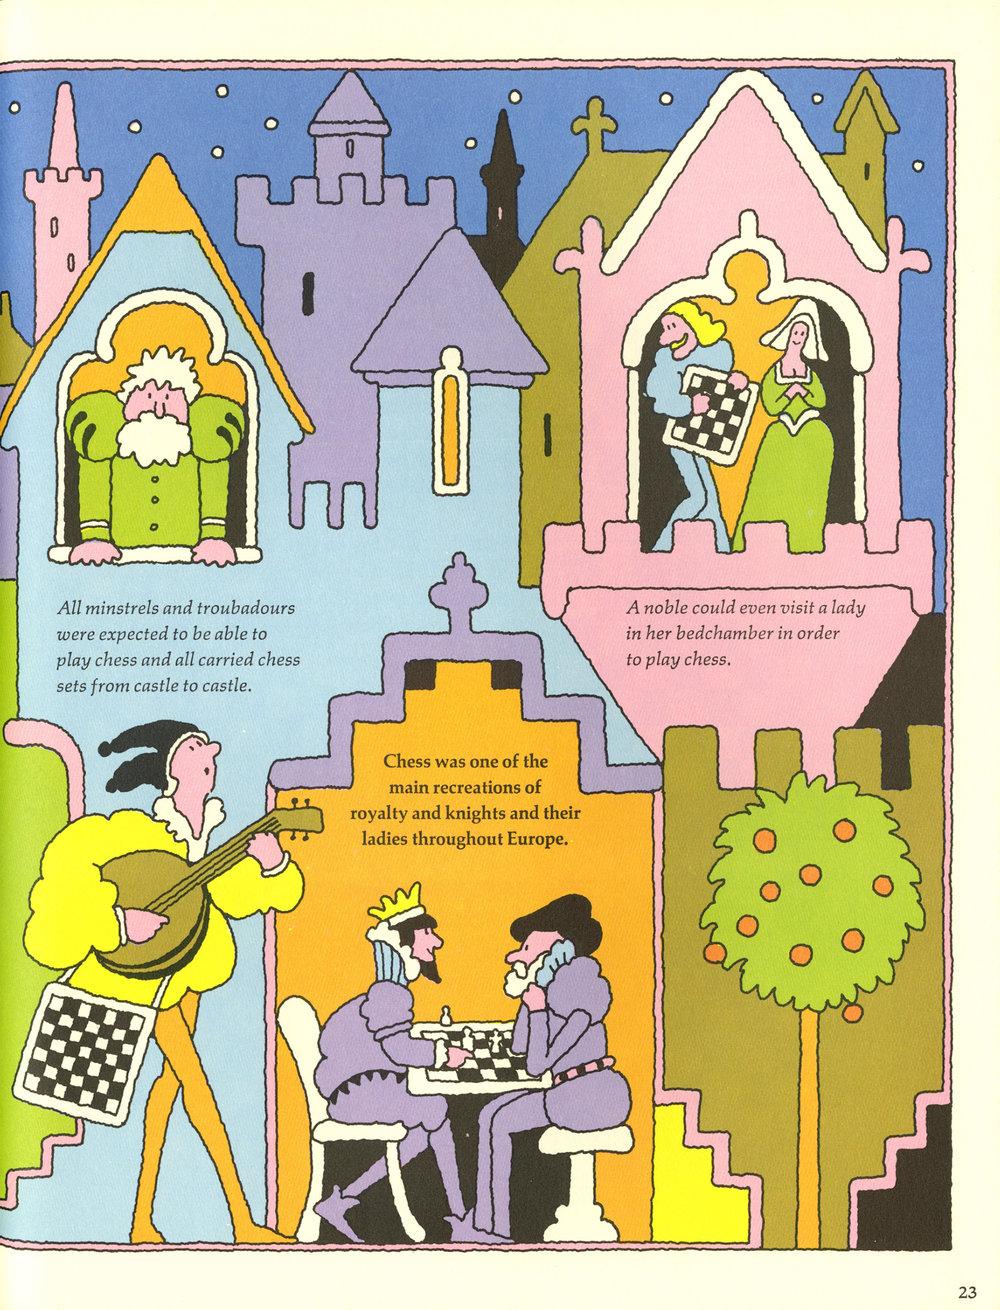 chess-book-6.jpg